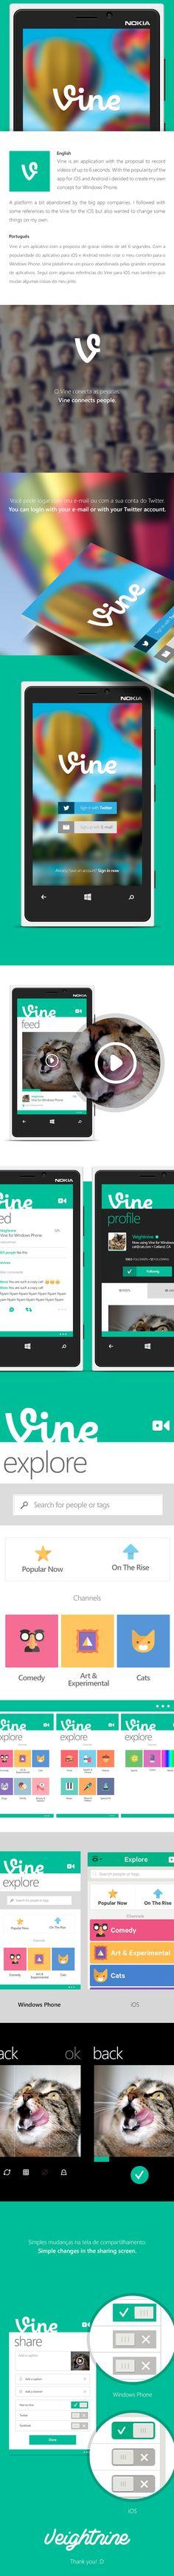 Vine Windows Phone by Victor Berbel, via Behance